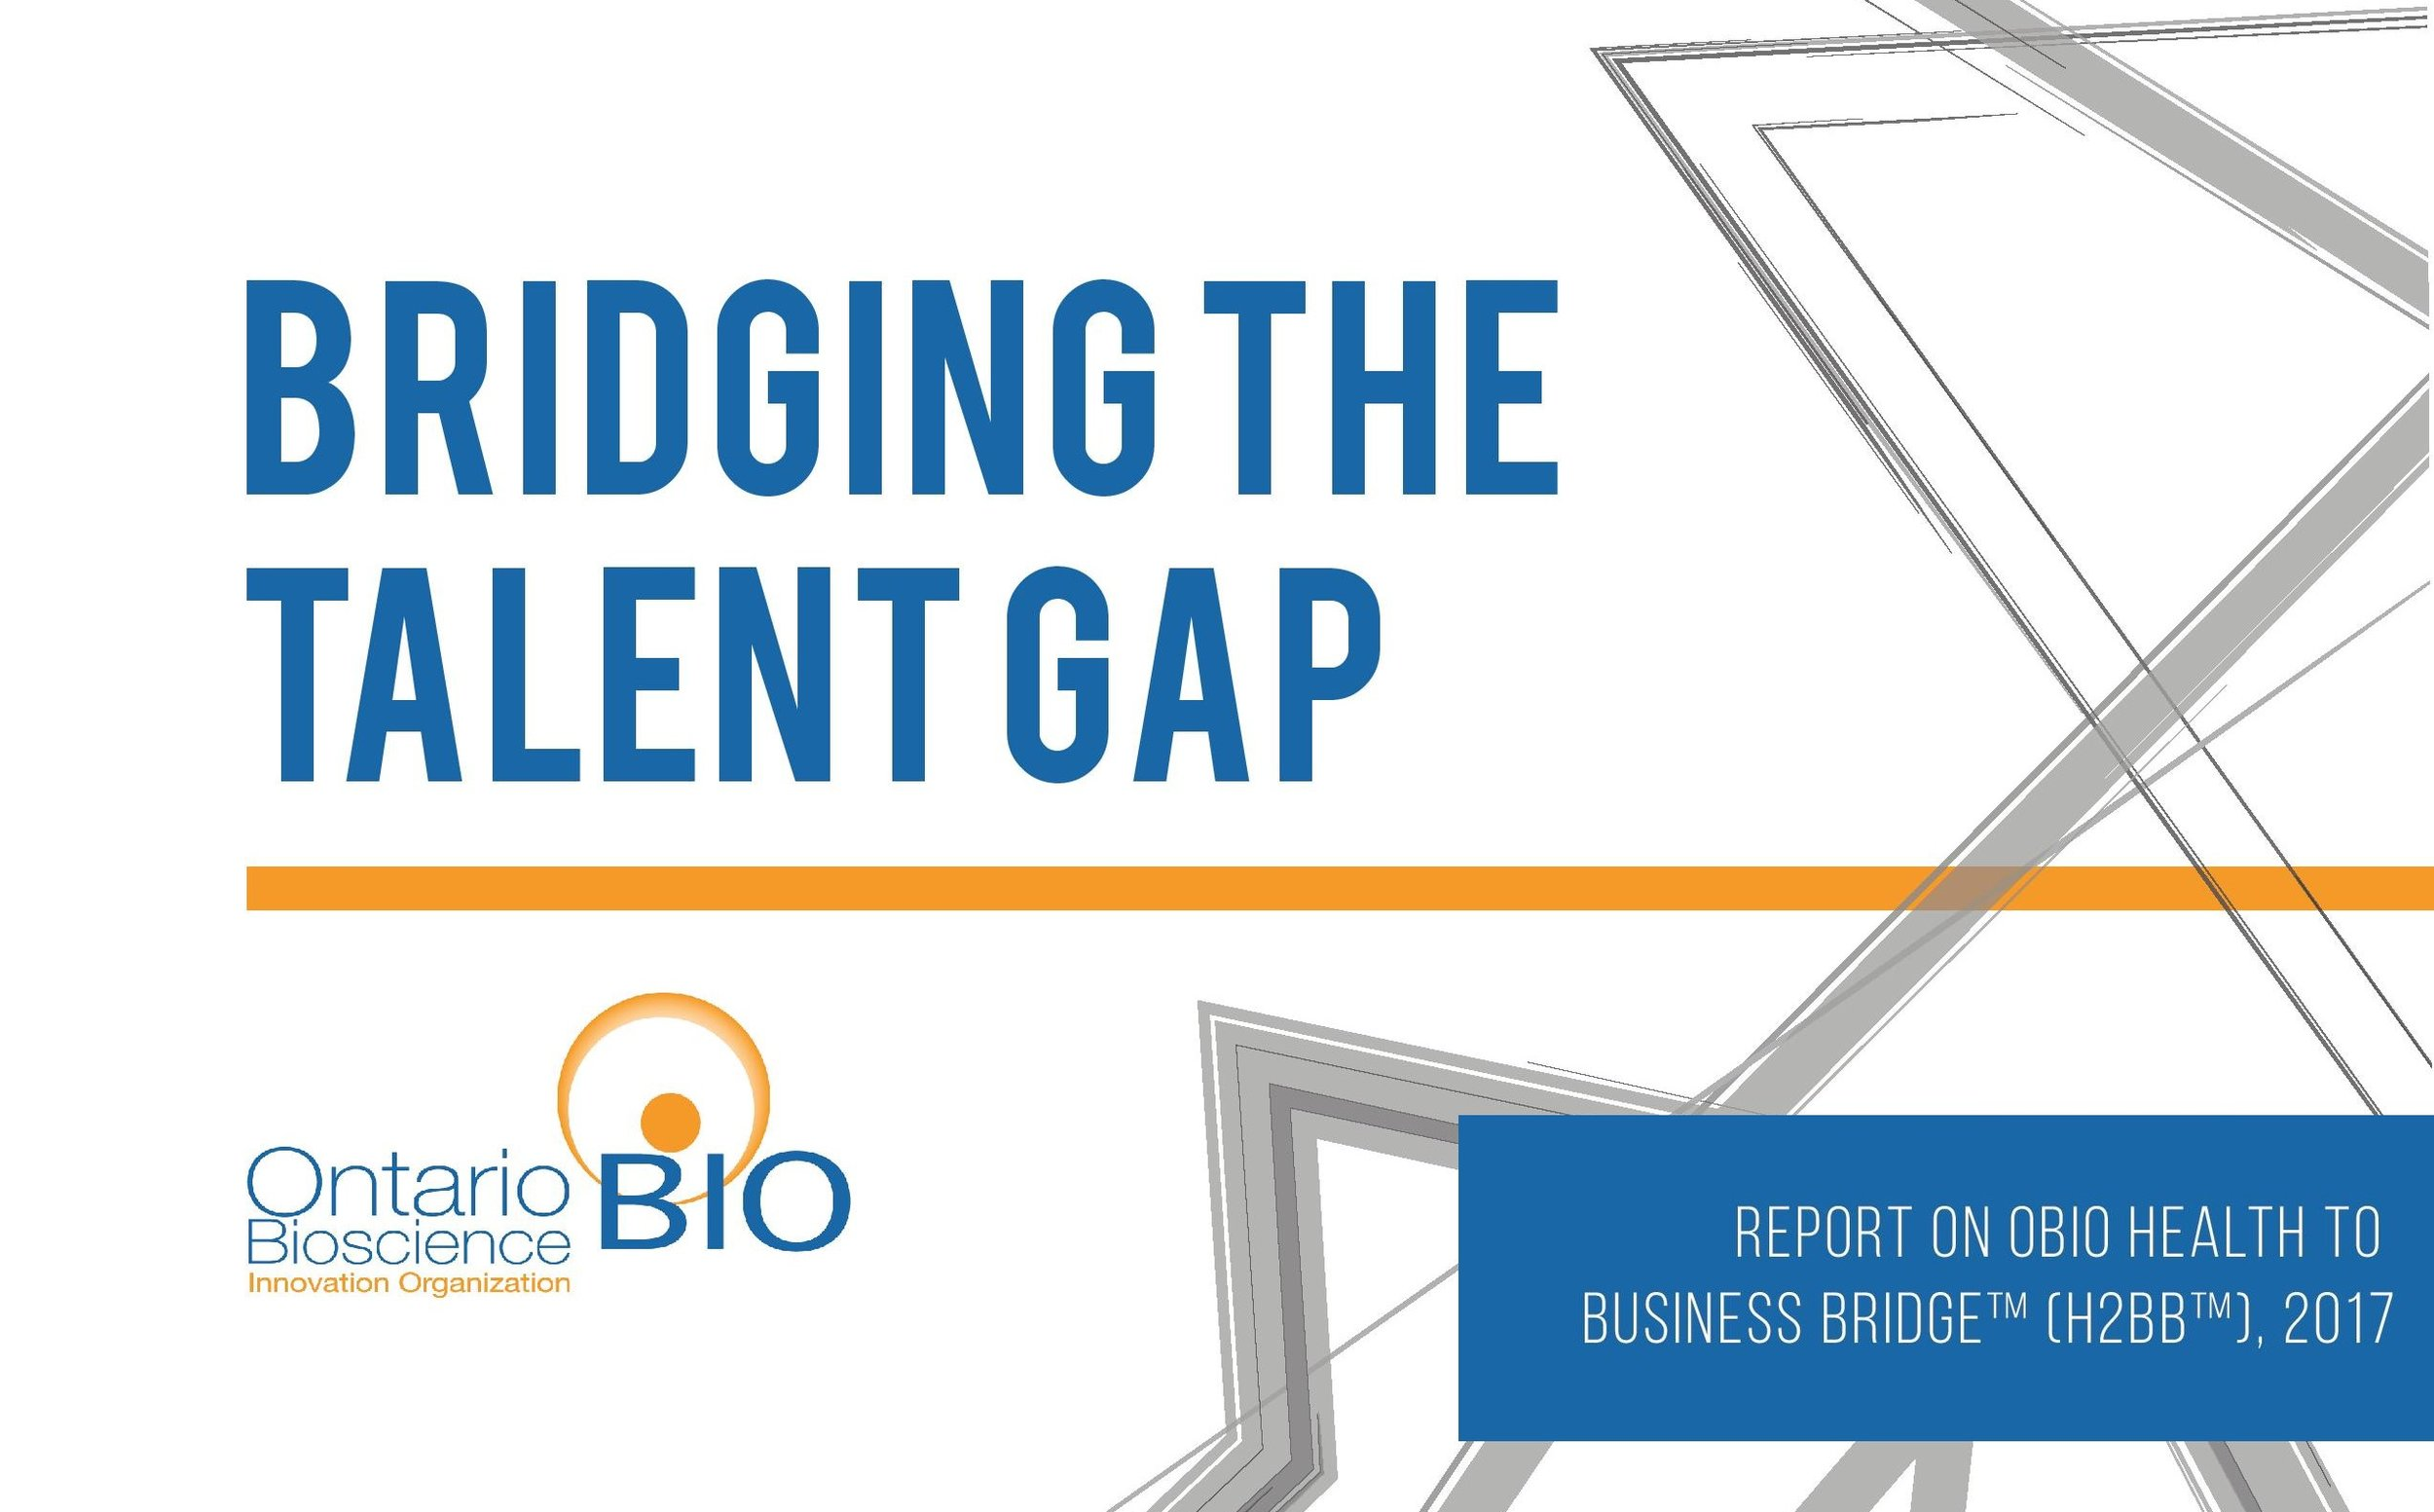 Bridging The Talent Gap.jpg